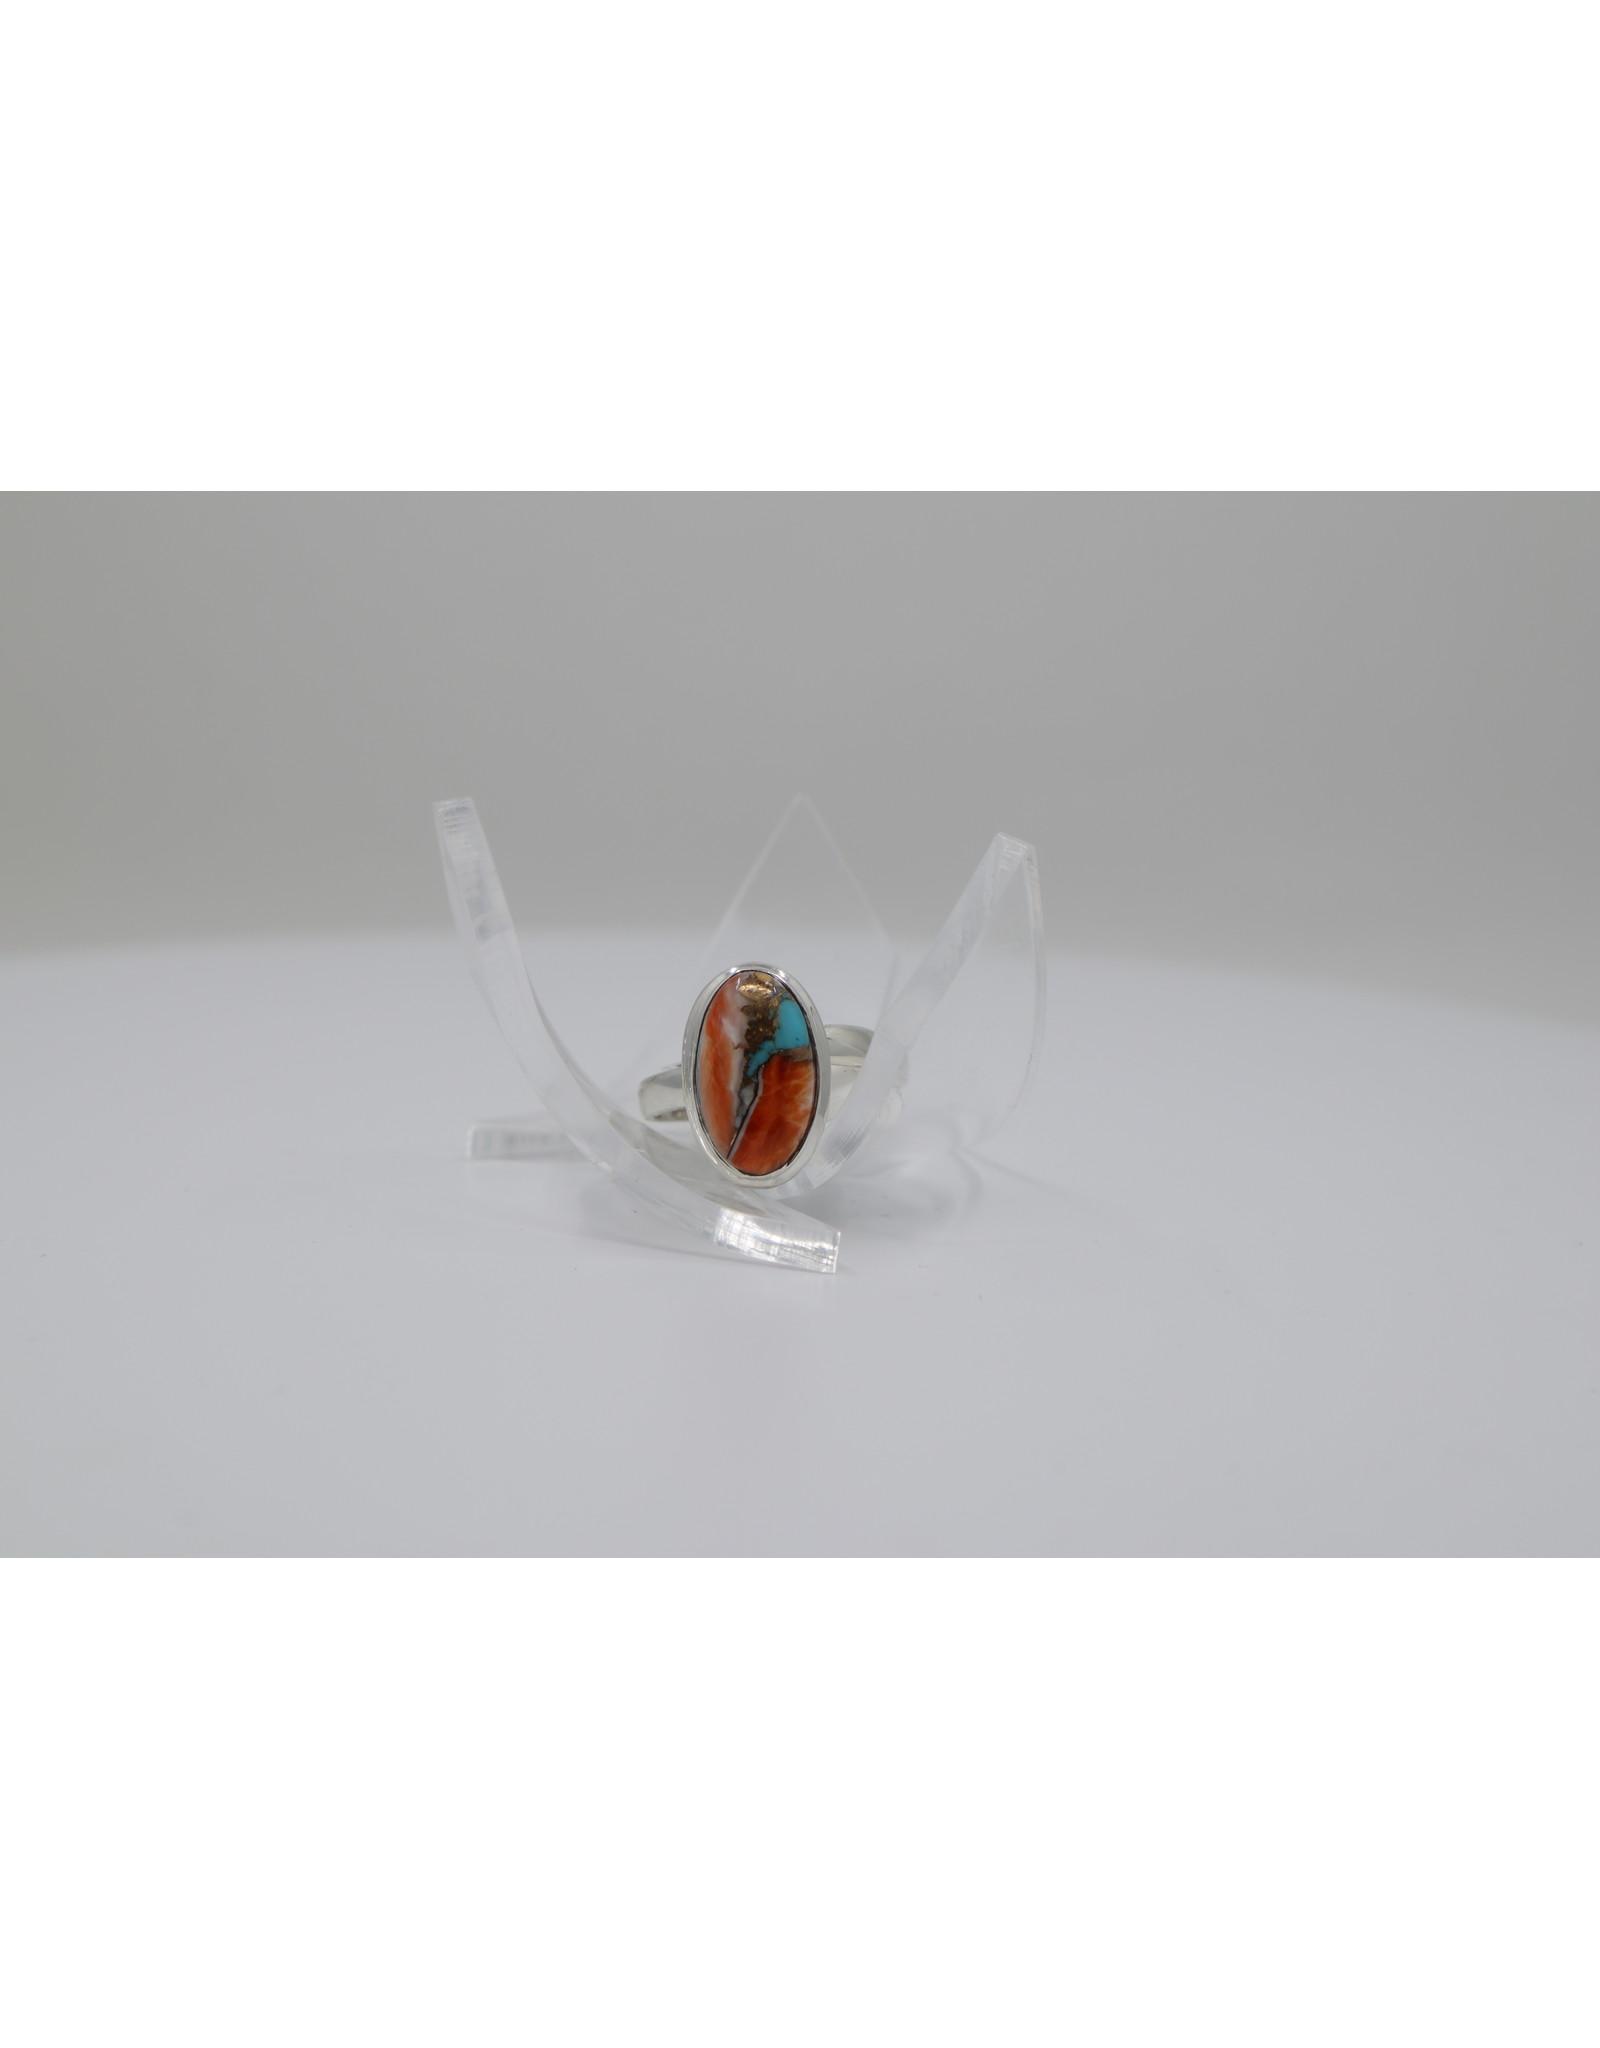 Arizona Turquoise Ring #2 - Adj